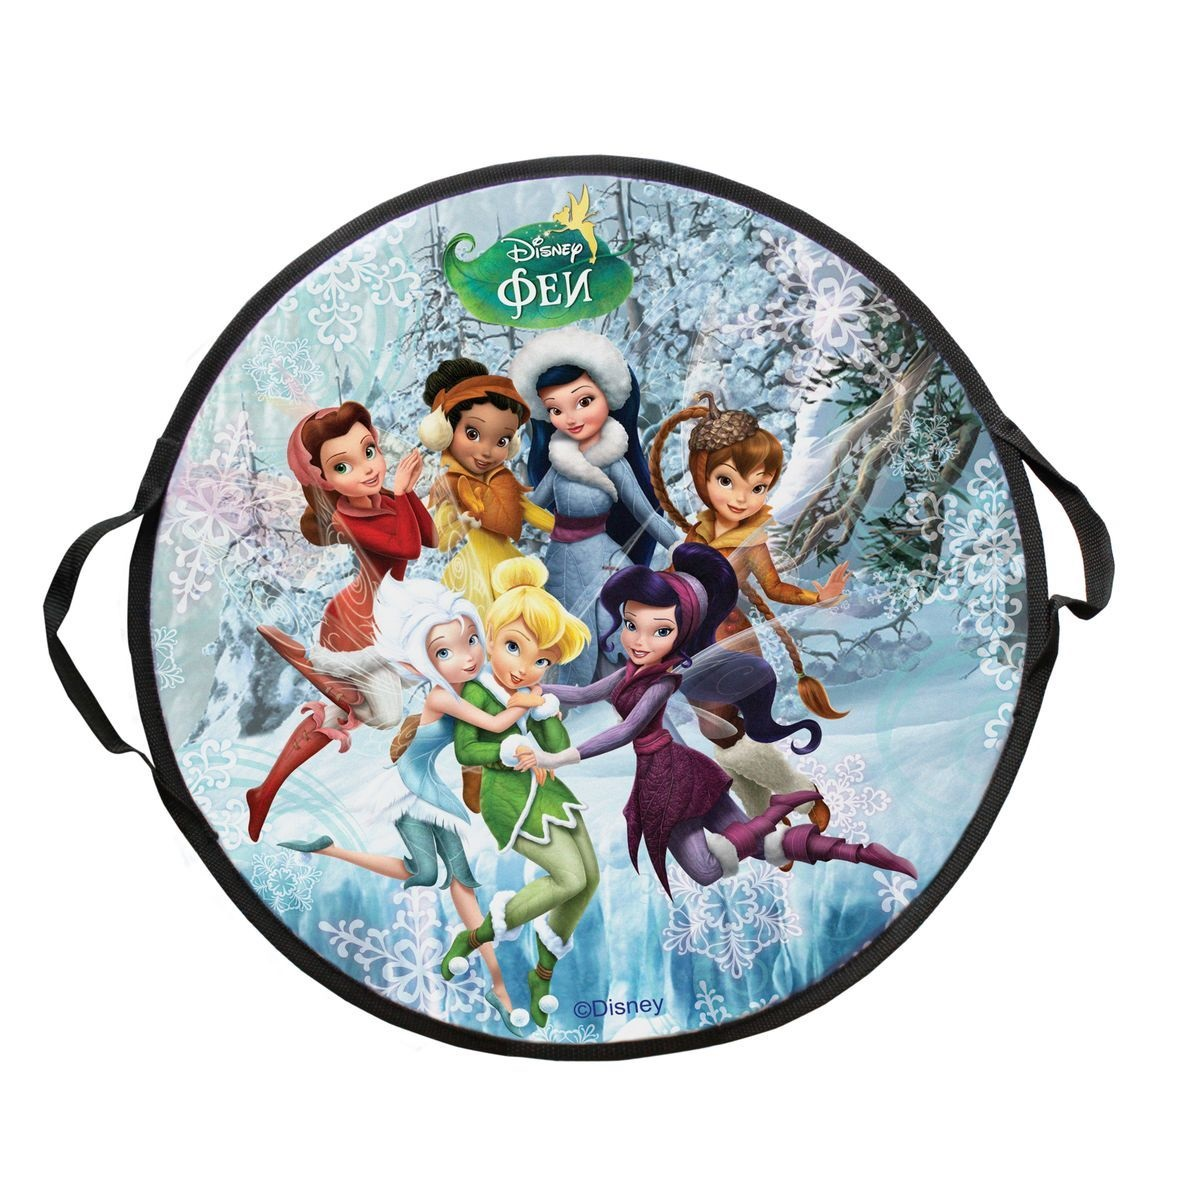 Ледянка круглая из серии Disney Феи, размер 52 см. 1TOY